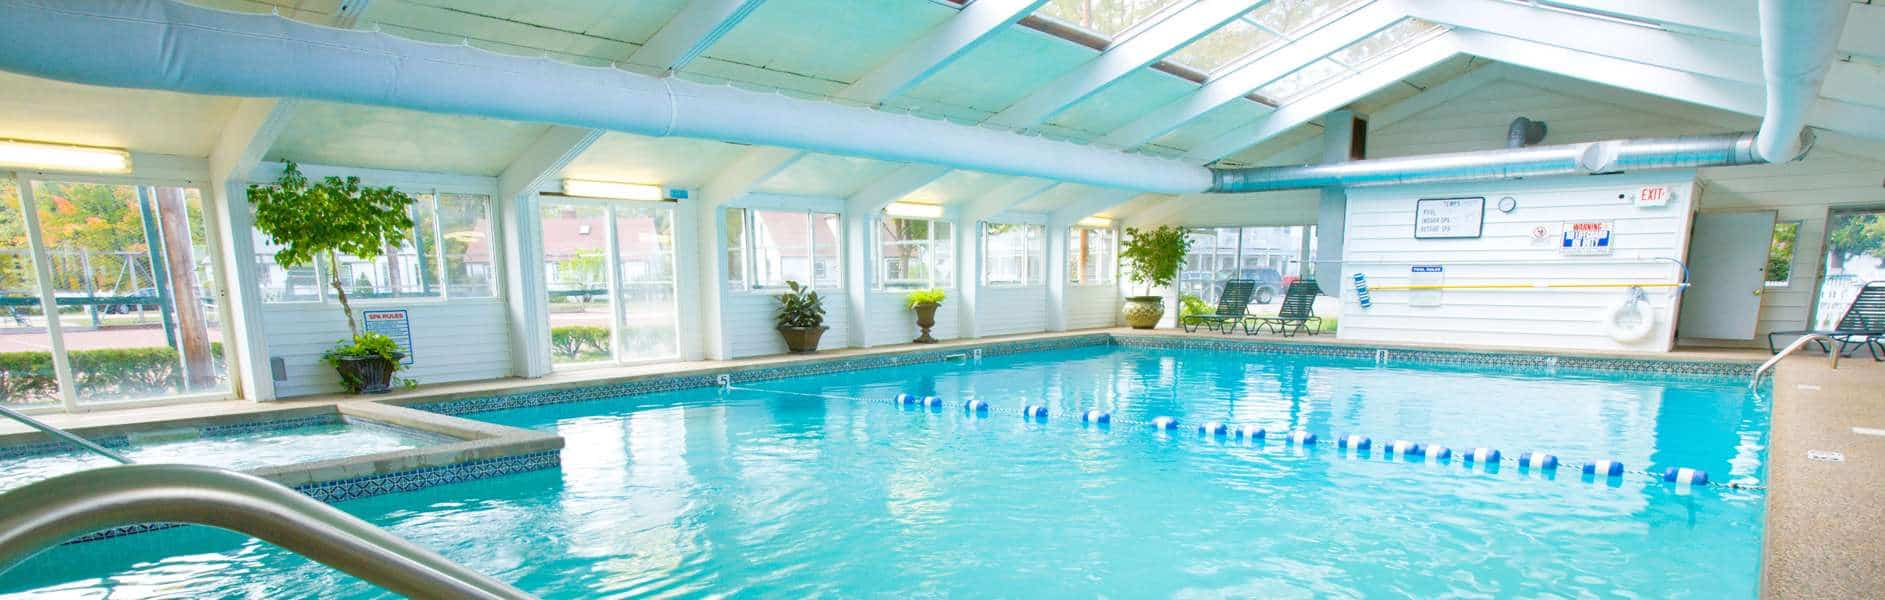 Pool at eastern slope inn